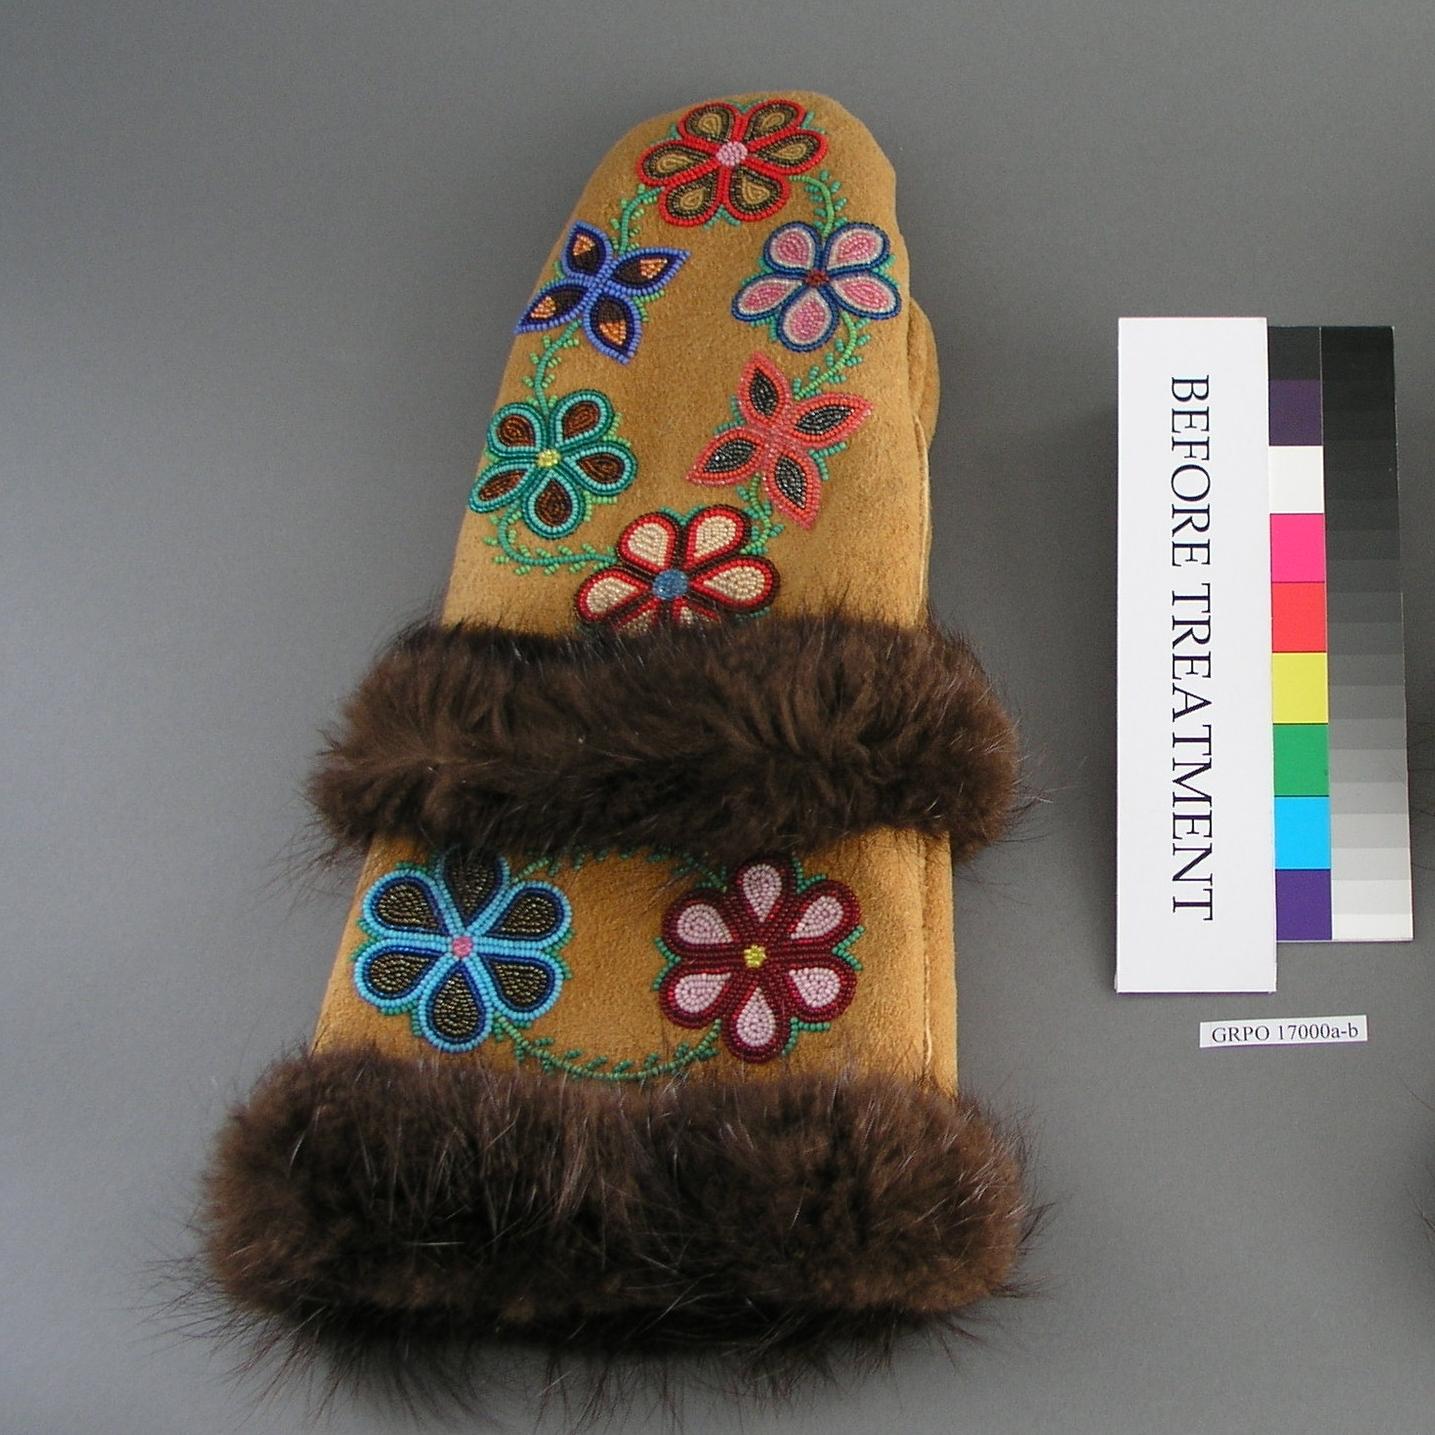 - ethnographic art conservation